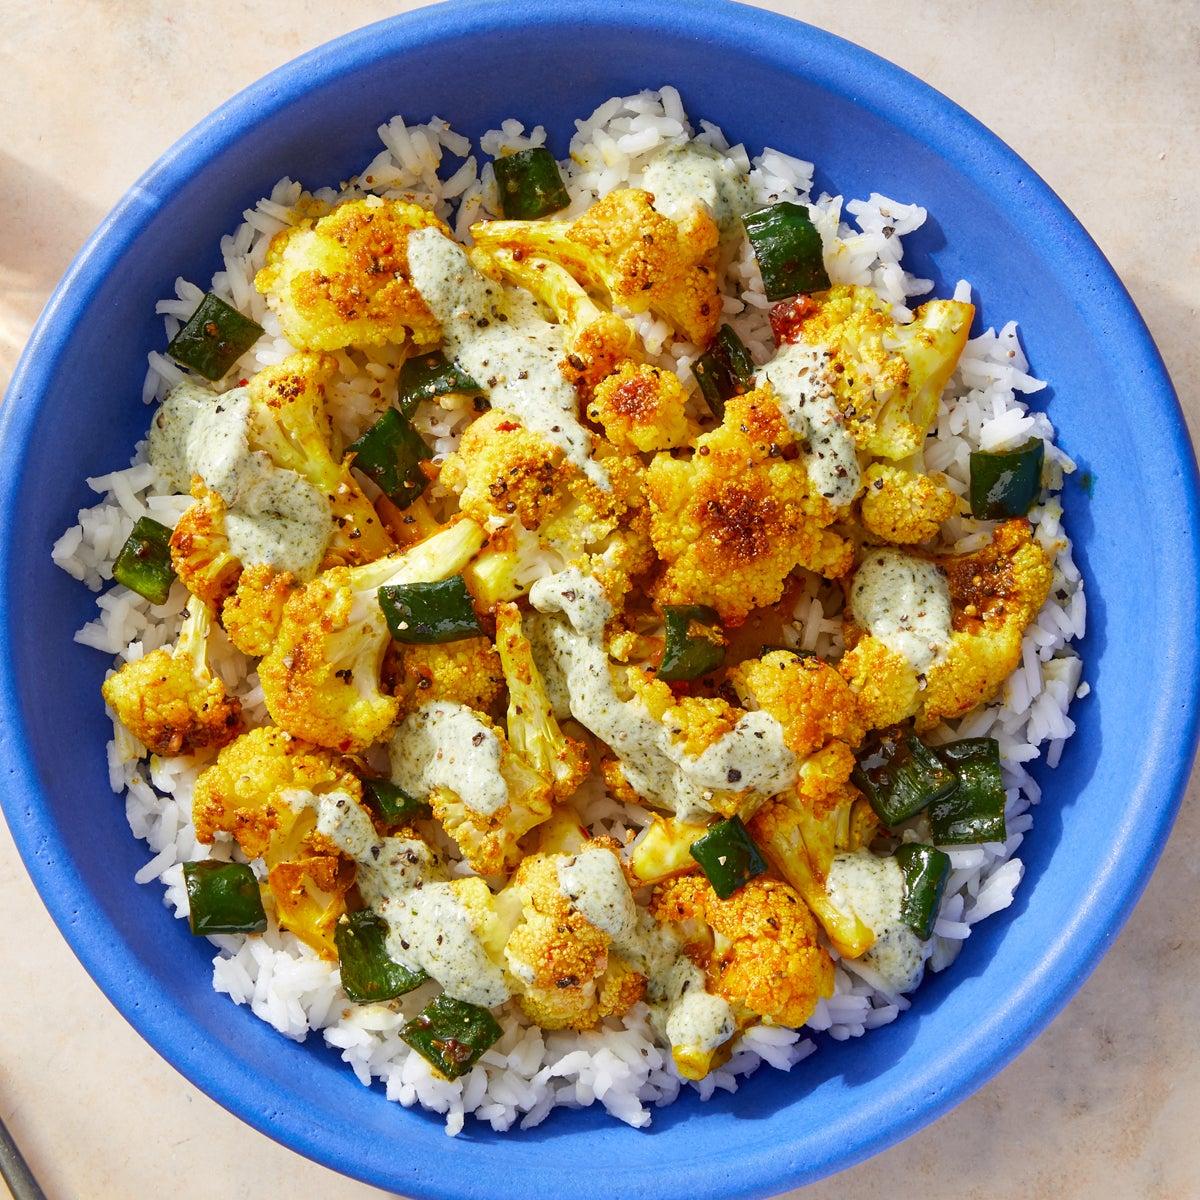 Curry-Roasted Cauliflower with Garlic Rice & Cilantro-Yogurt Sauce